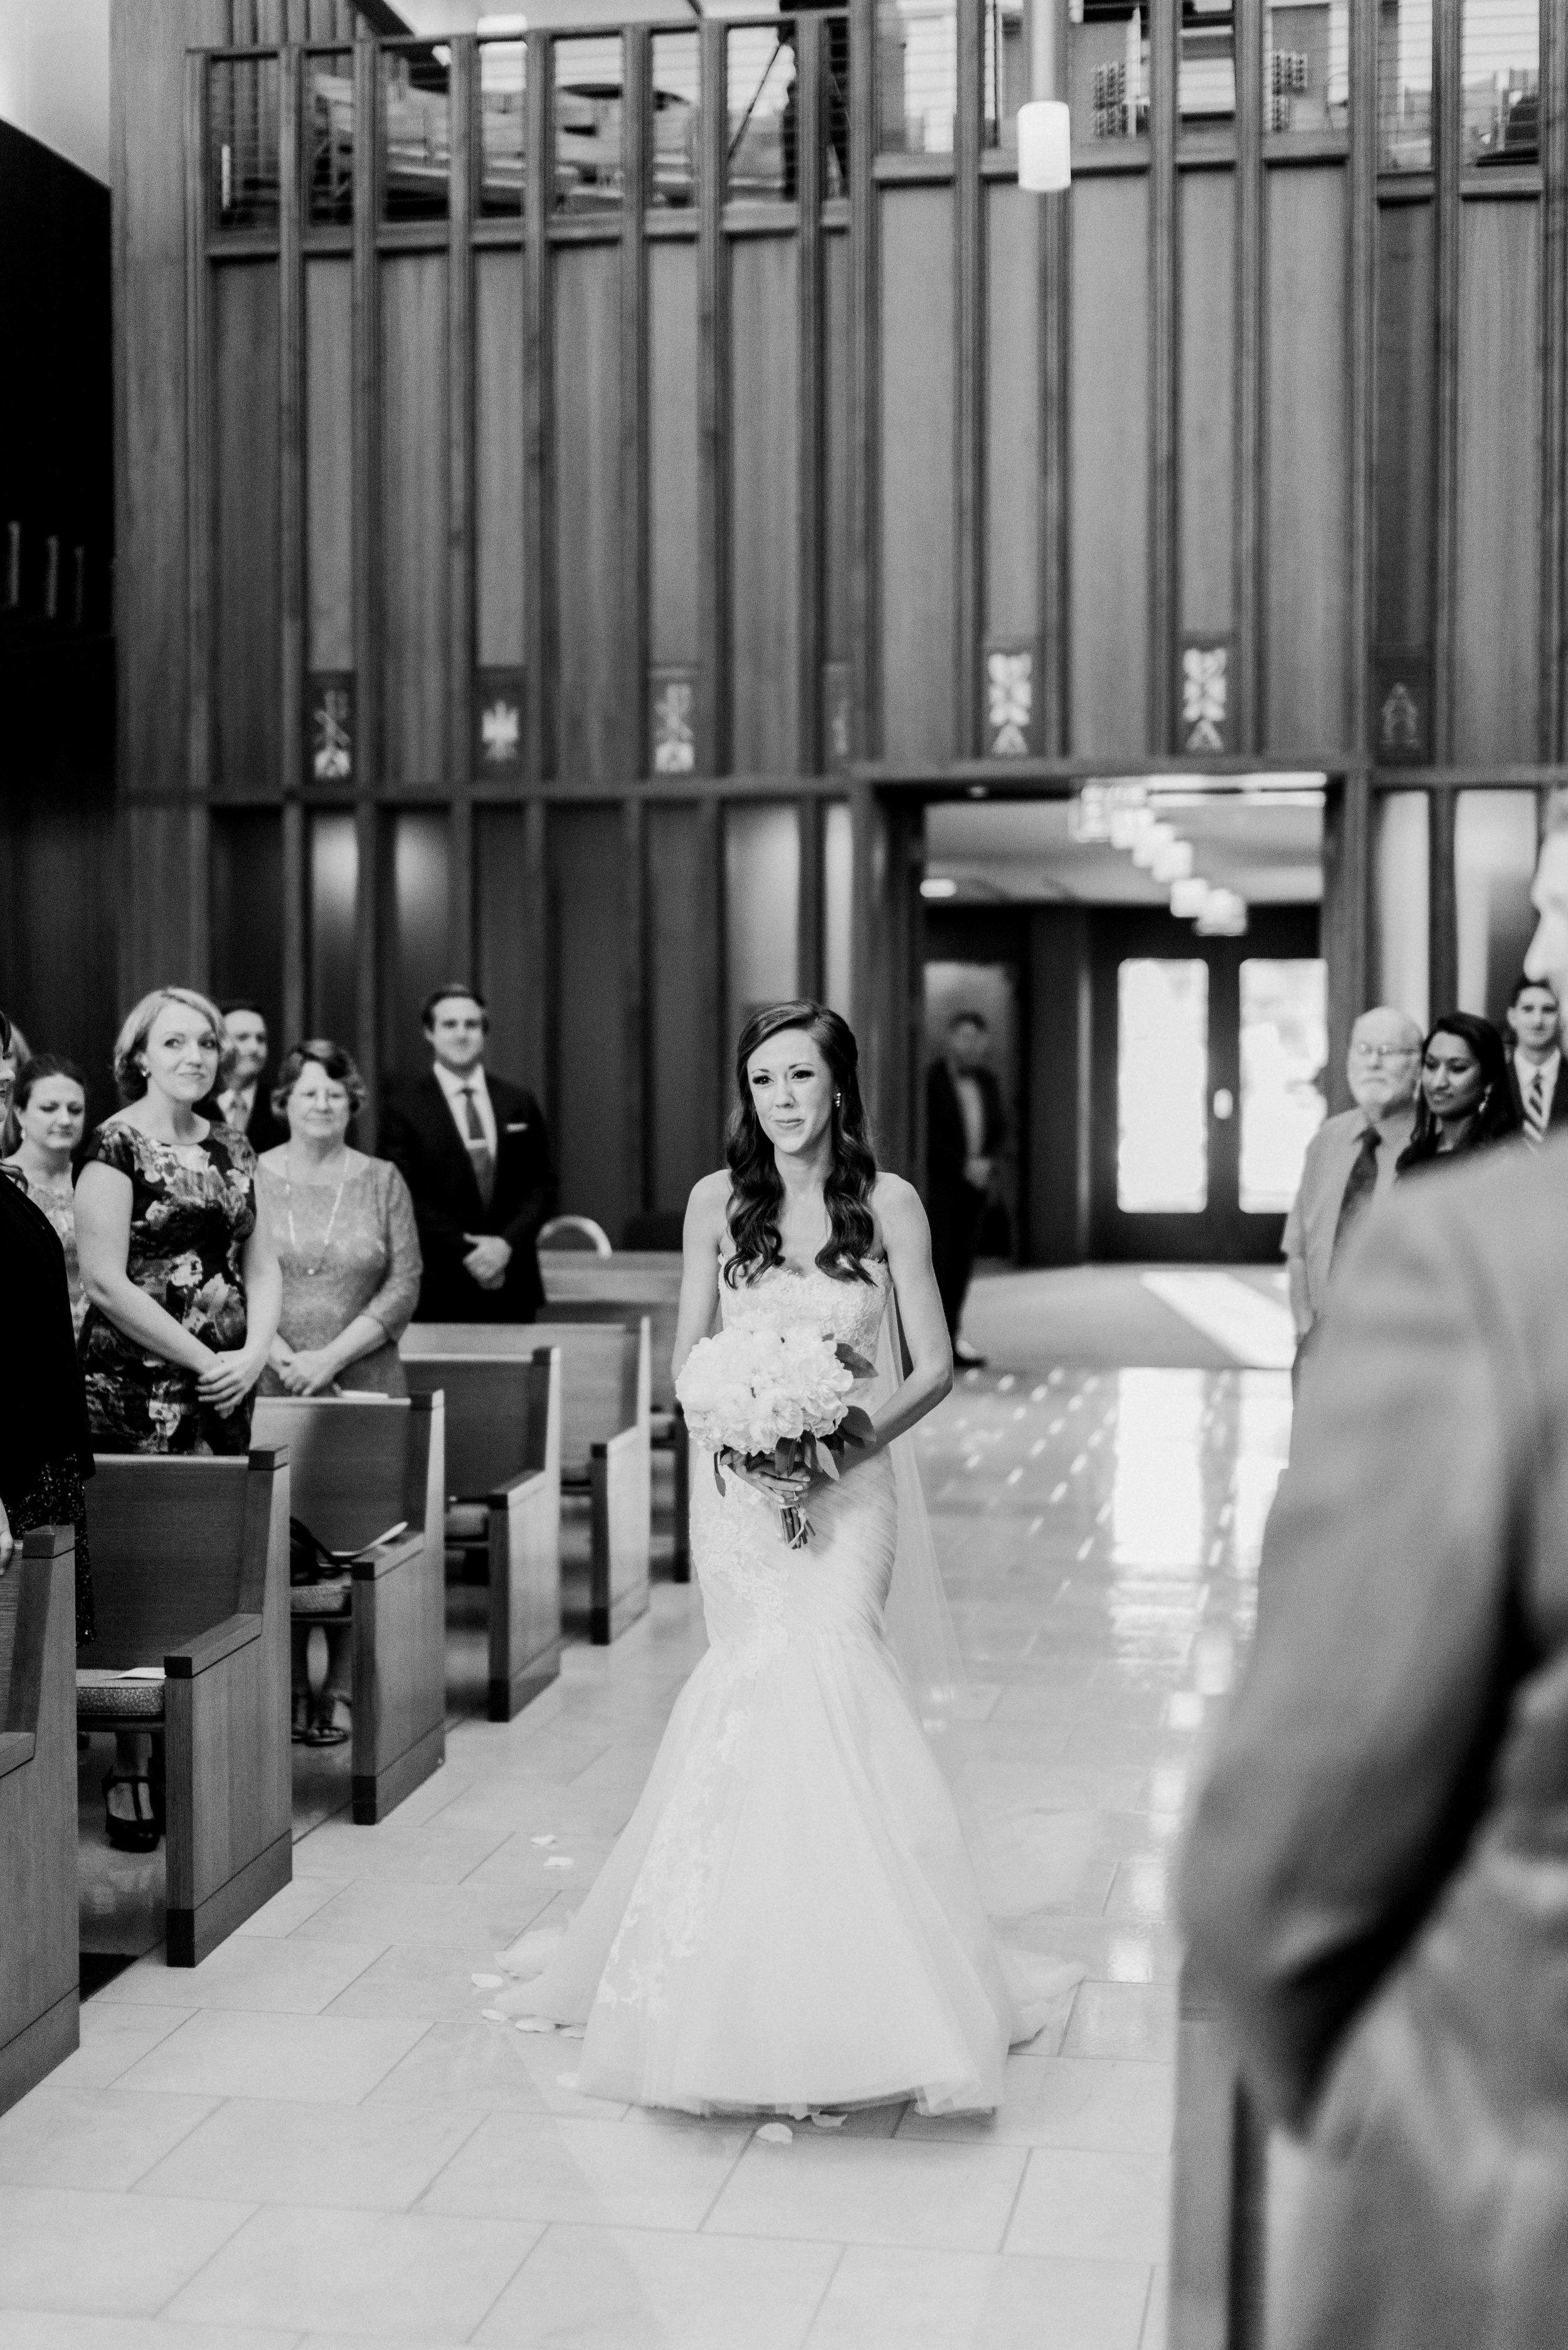 St.-Philip-Presbyterian-Church-Houston-Wedding-Ceremony-The-Junior-League-Of-Houston-Reception-Dana-Fernandez-Photography-Fine-Art-Film-24.jpg